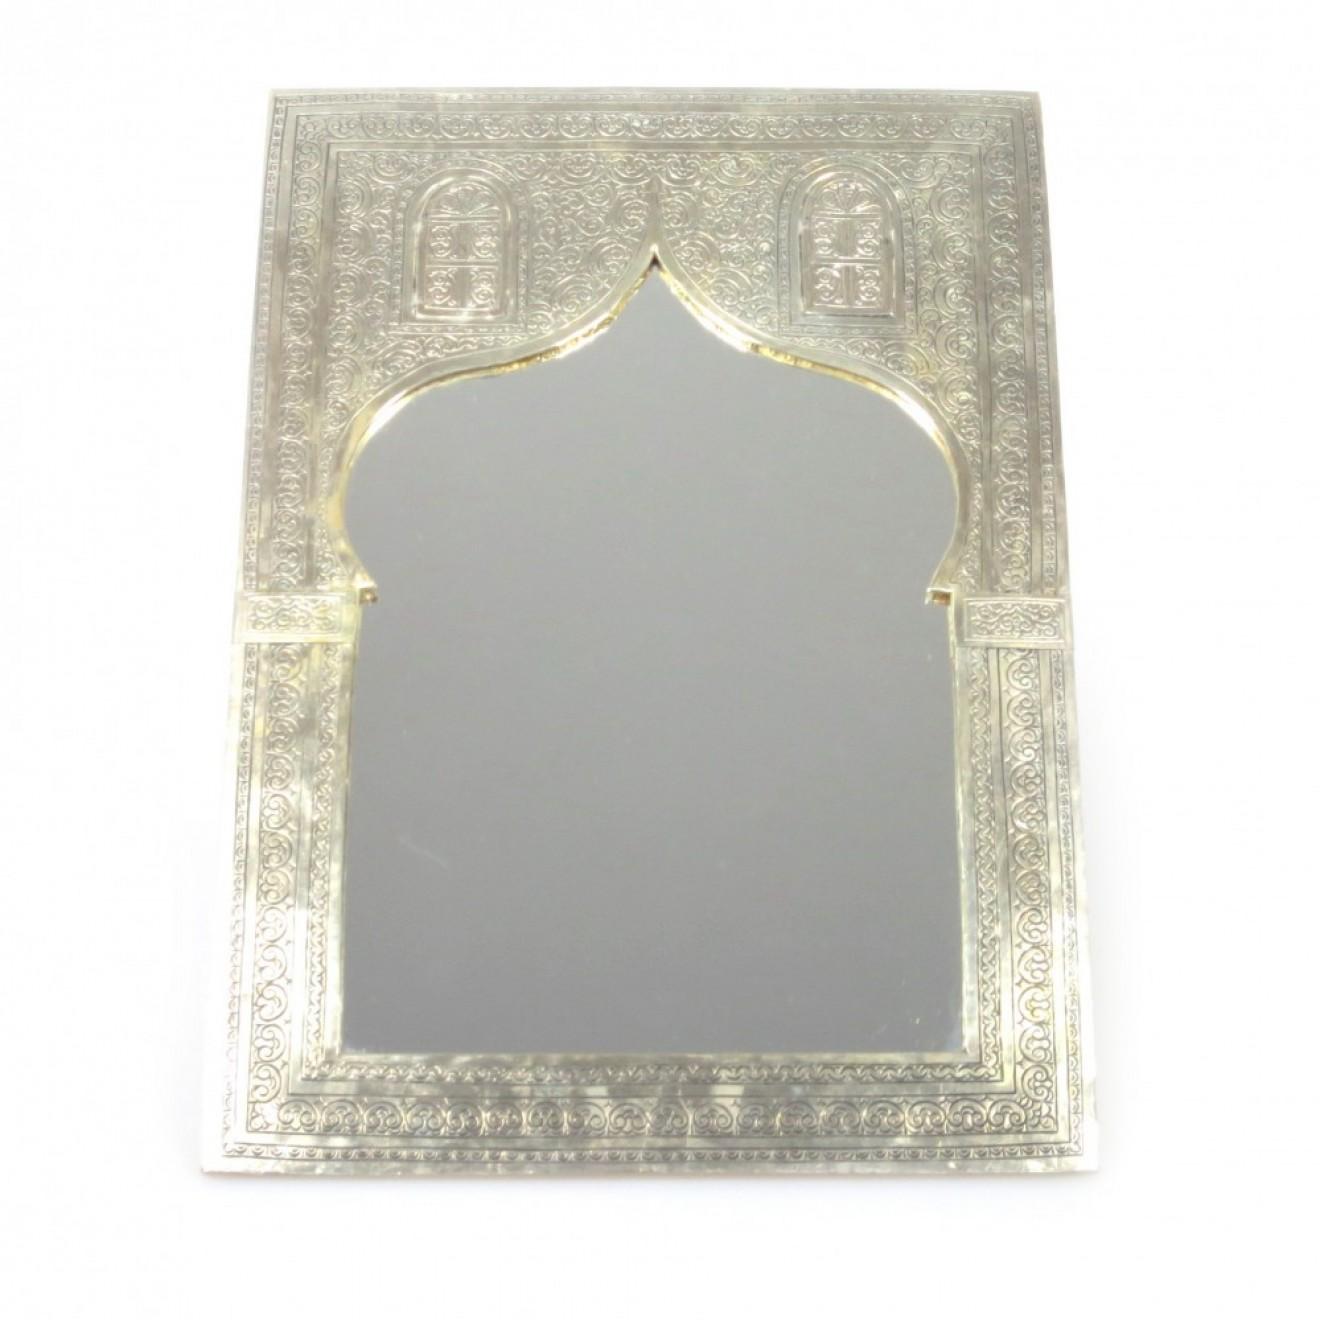 marokkanischer spiegel gross just be kaufhaus der lebensfreude. Black Bedroom Furniture Sets. Home Design Ideas